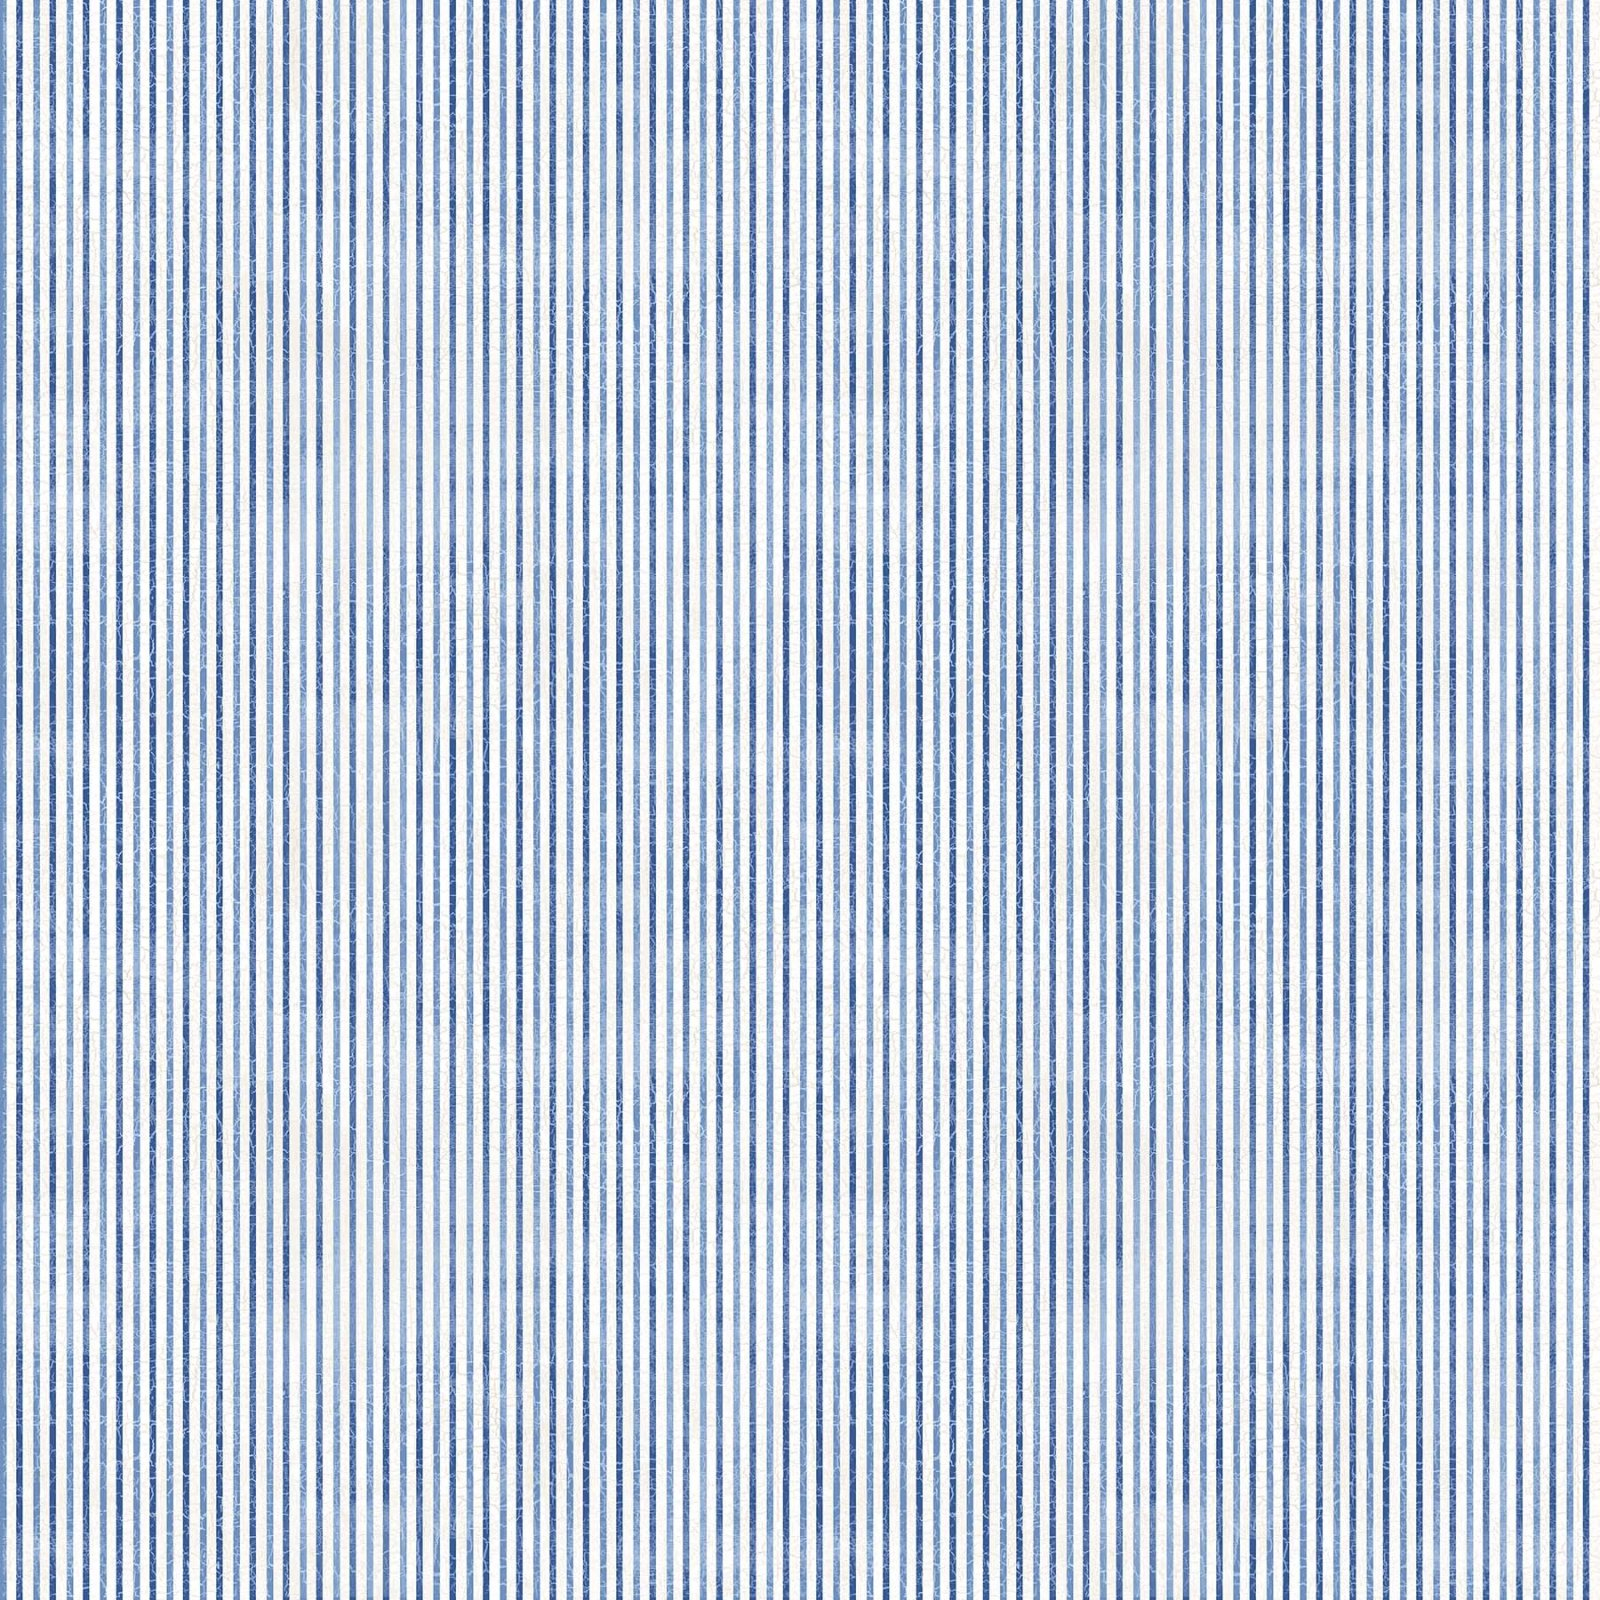 Seafood Shack Stripe Blue